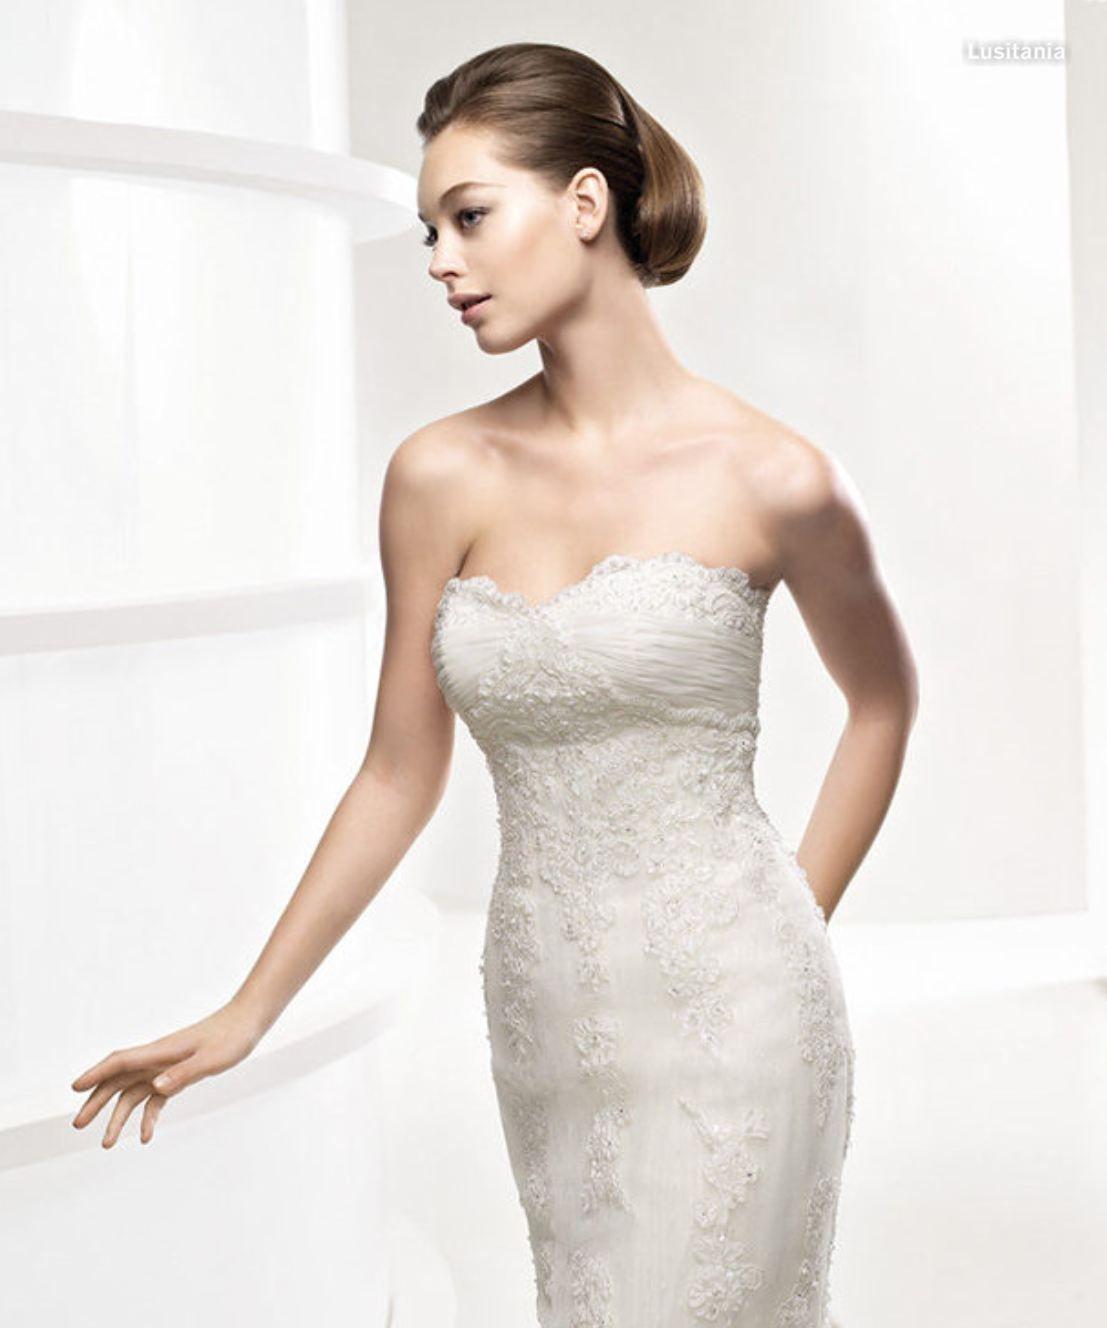 Lustania Pronovias Wedding Dress